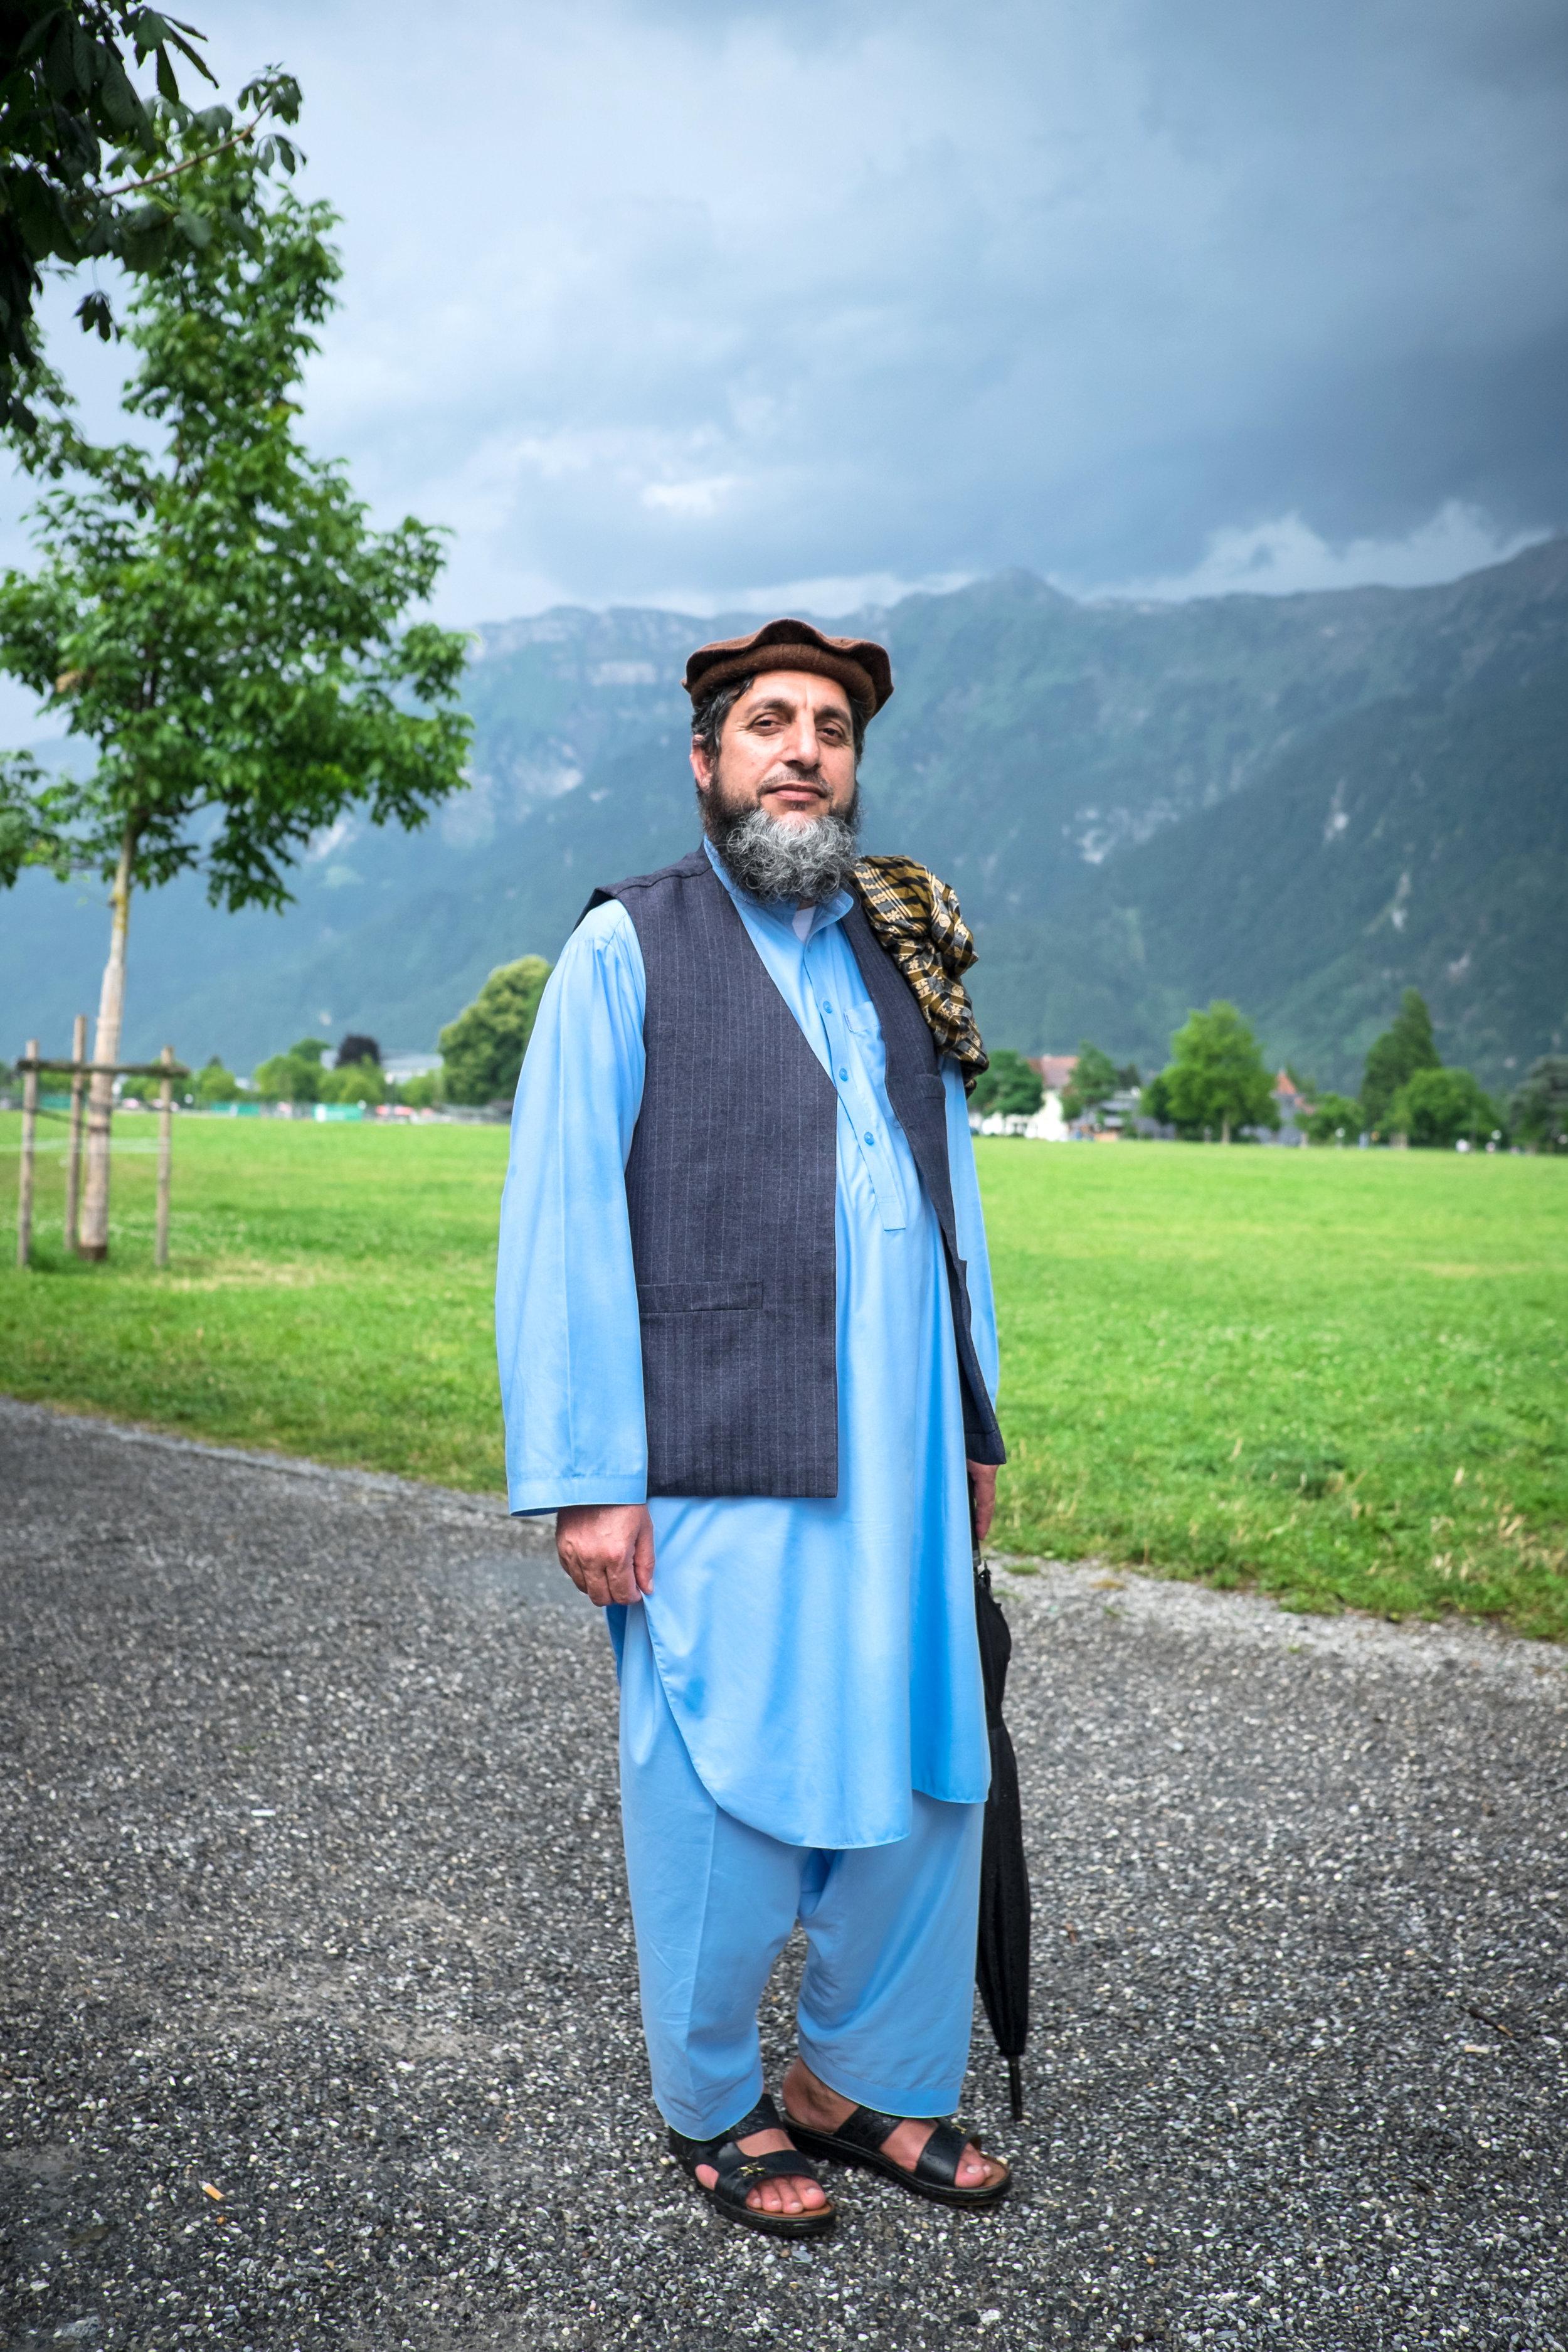 20_Interlaken_Muslime_MarcoZanoni.JPG